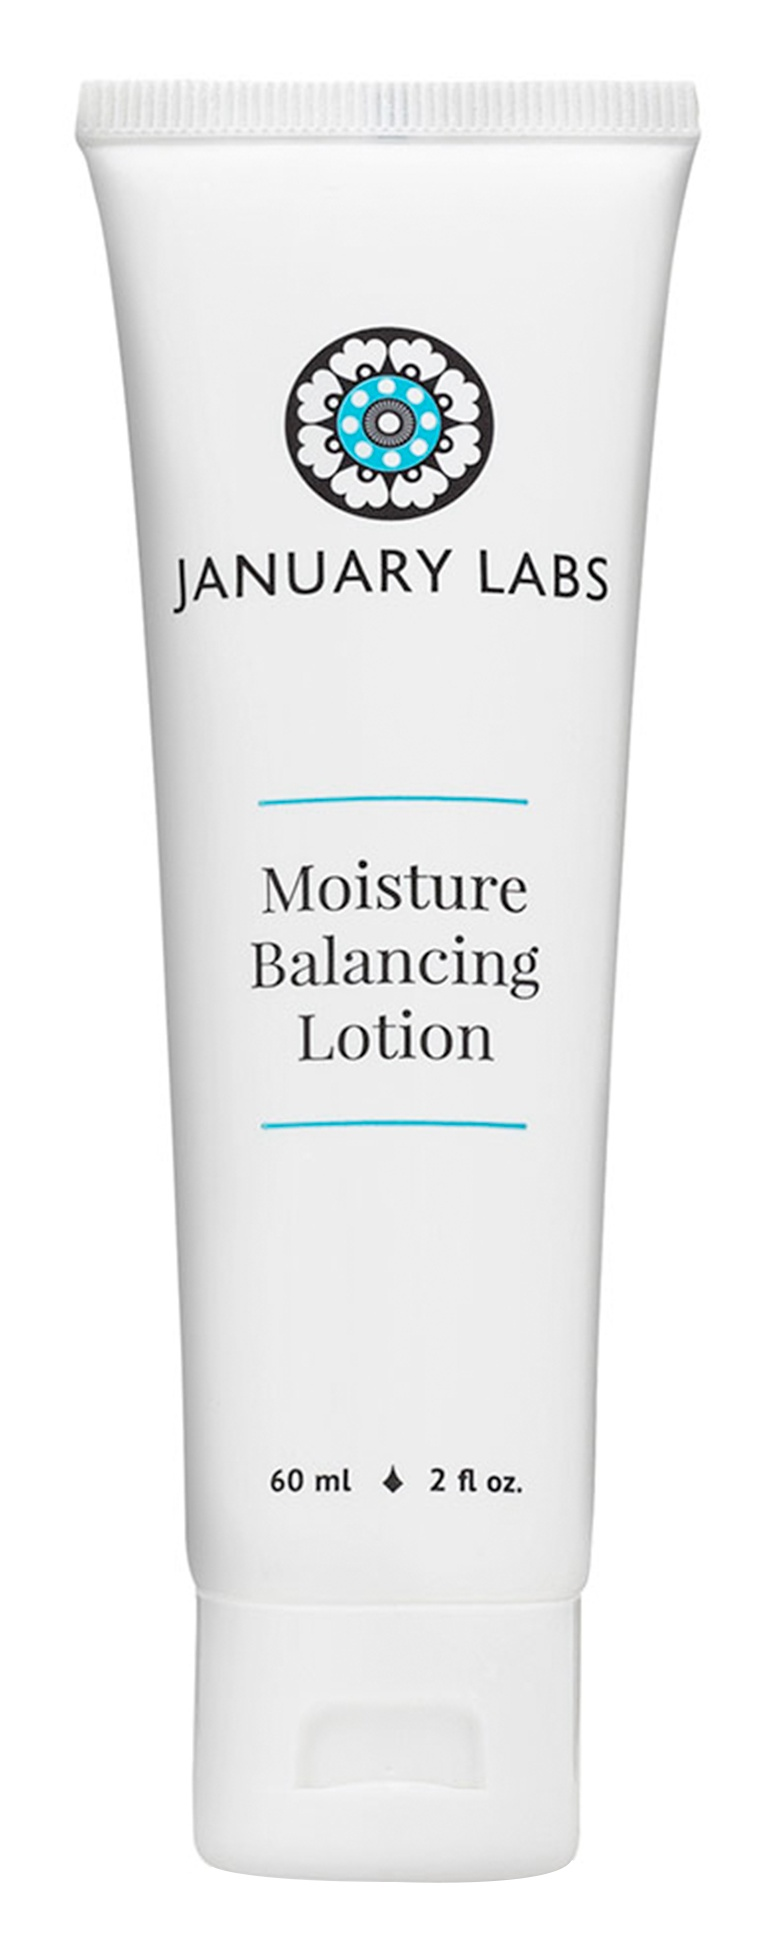 January Labs Moisture Balancing Lotion